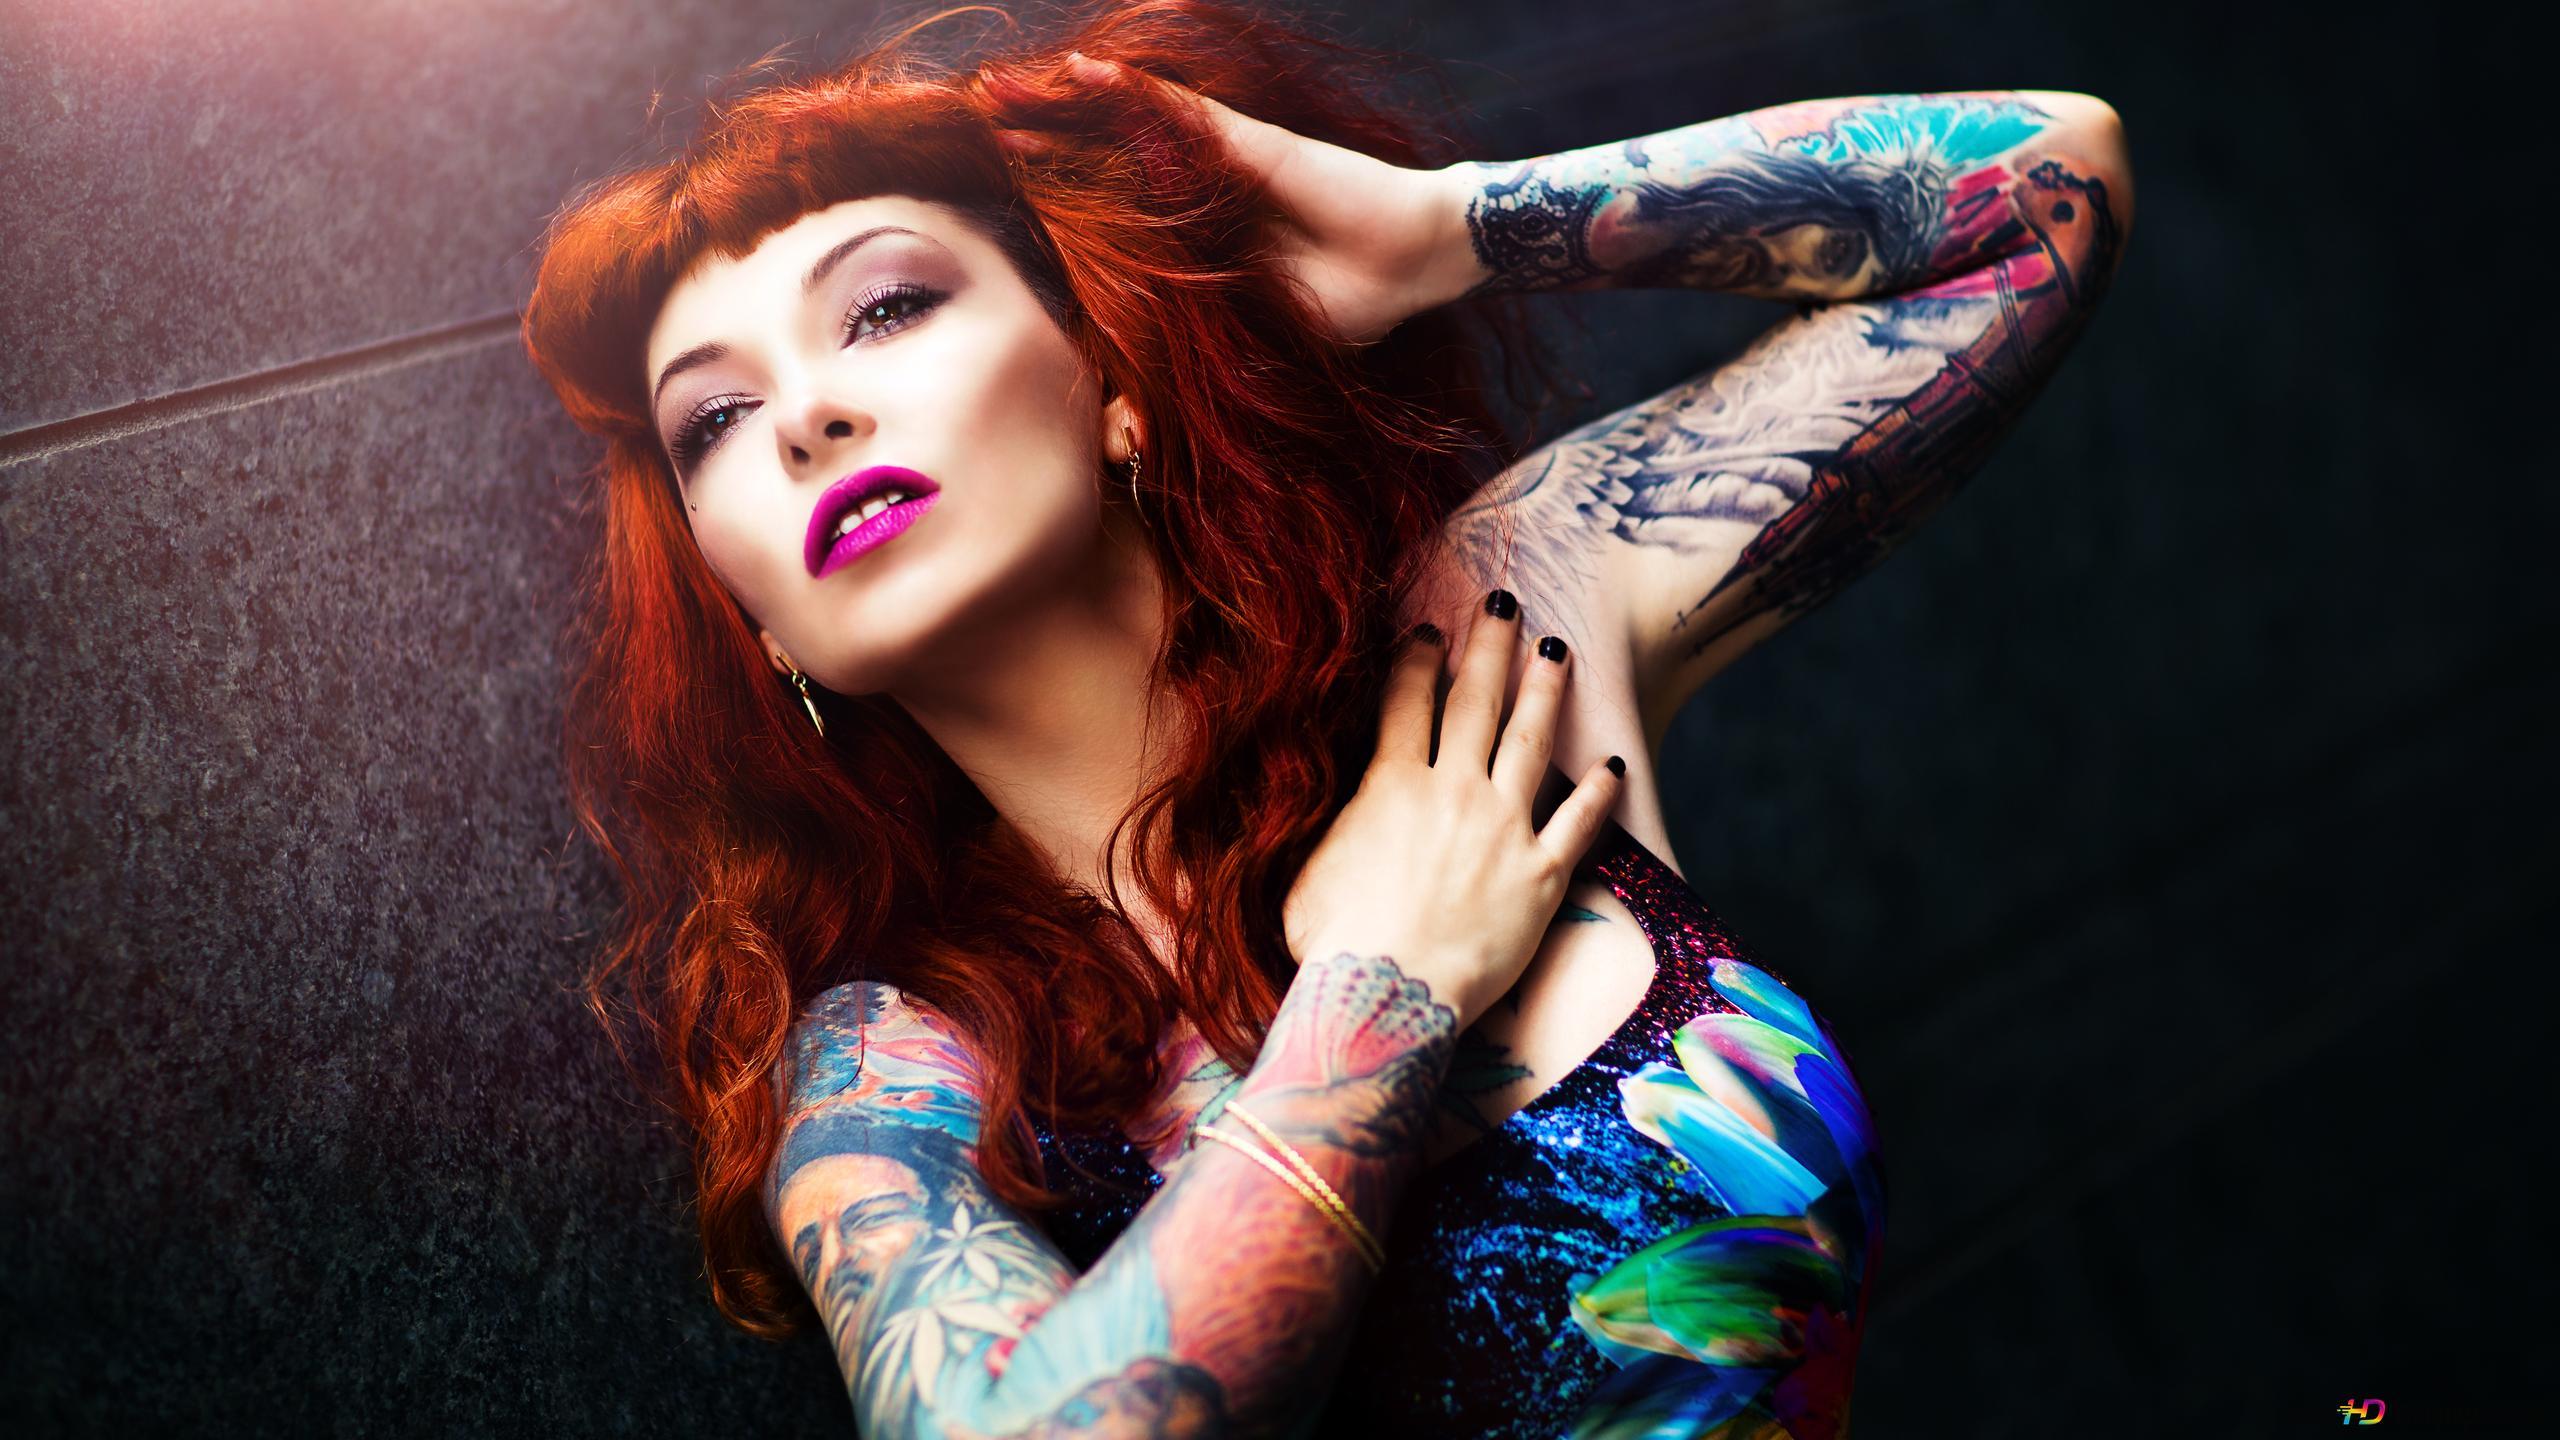 Descargar Fondo De Pantalla Mujer Tatuaje Hd